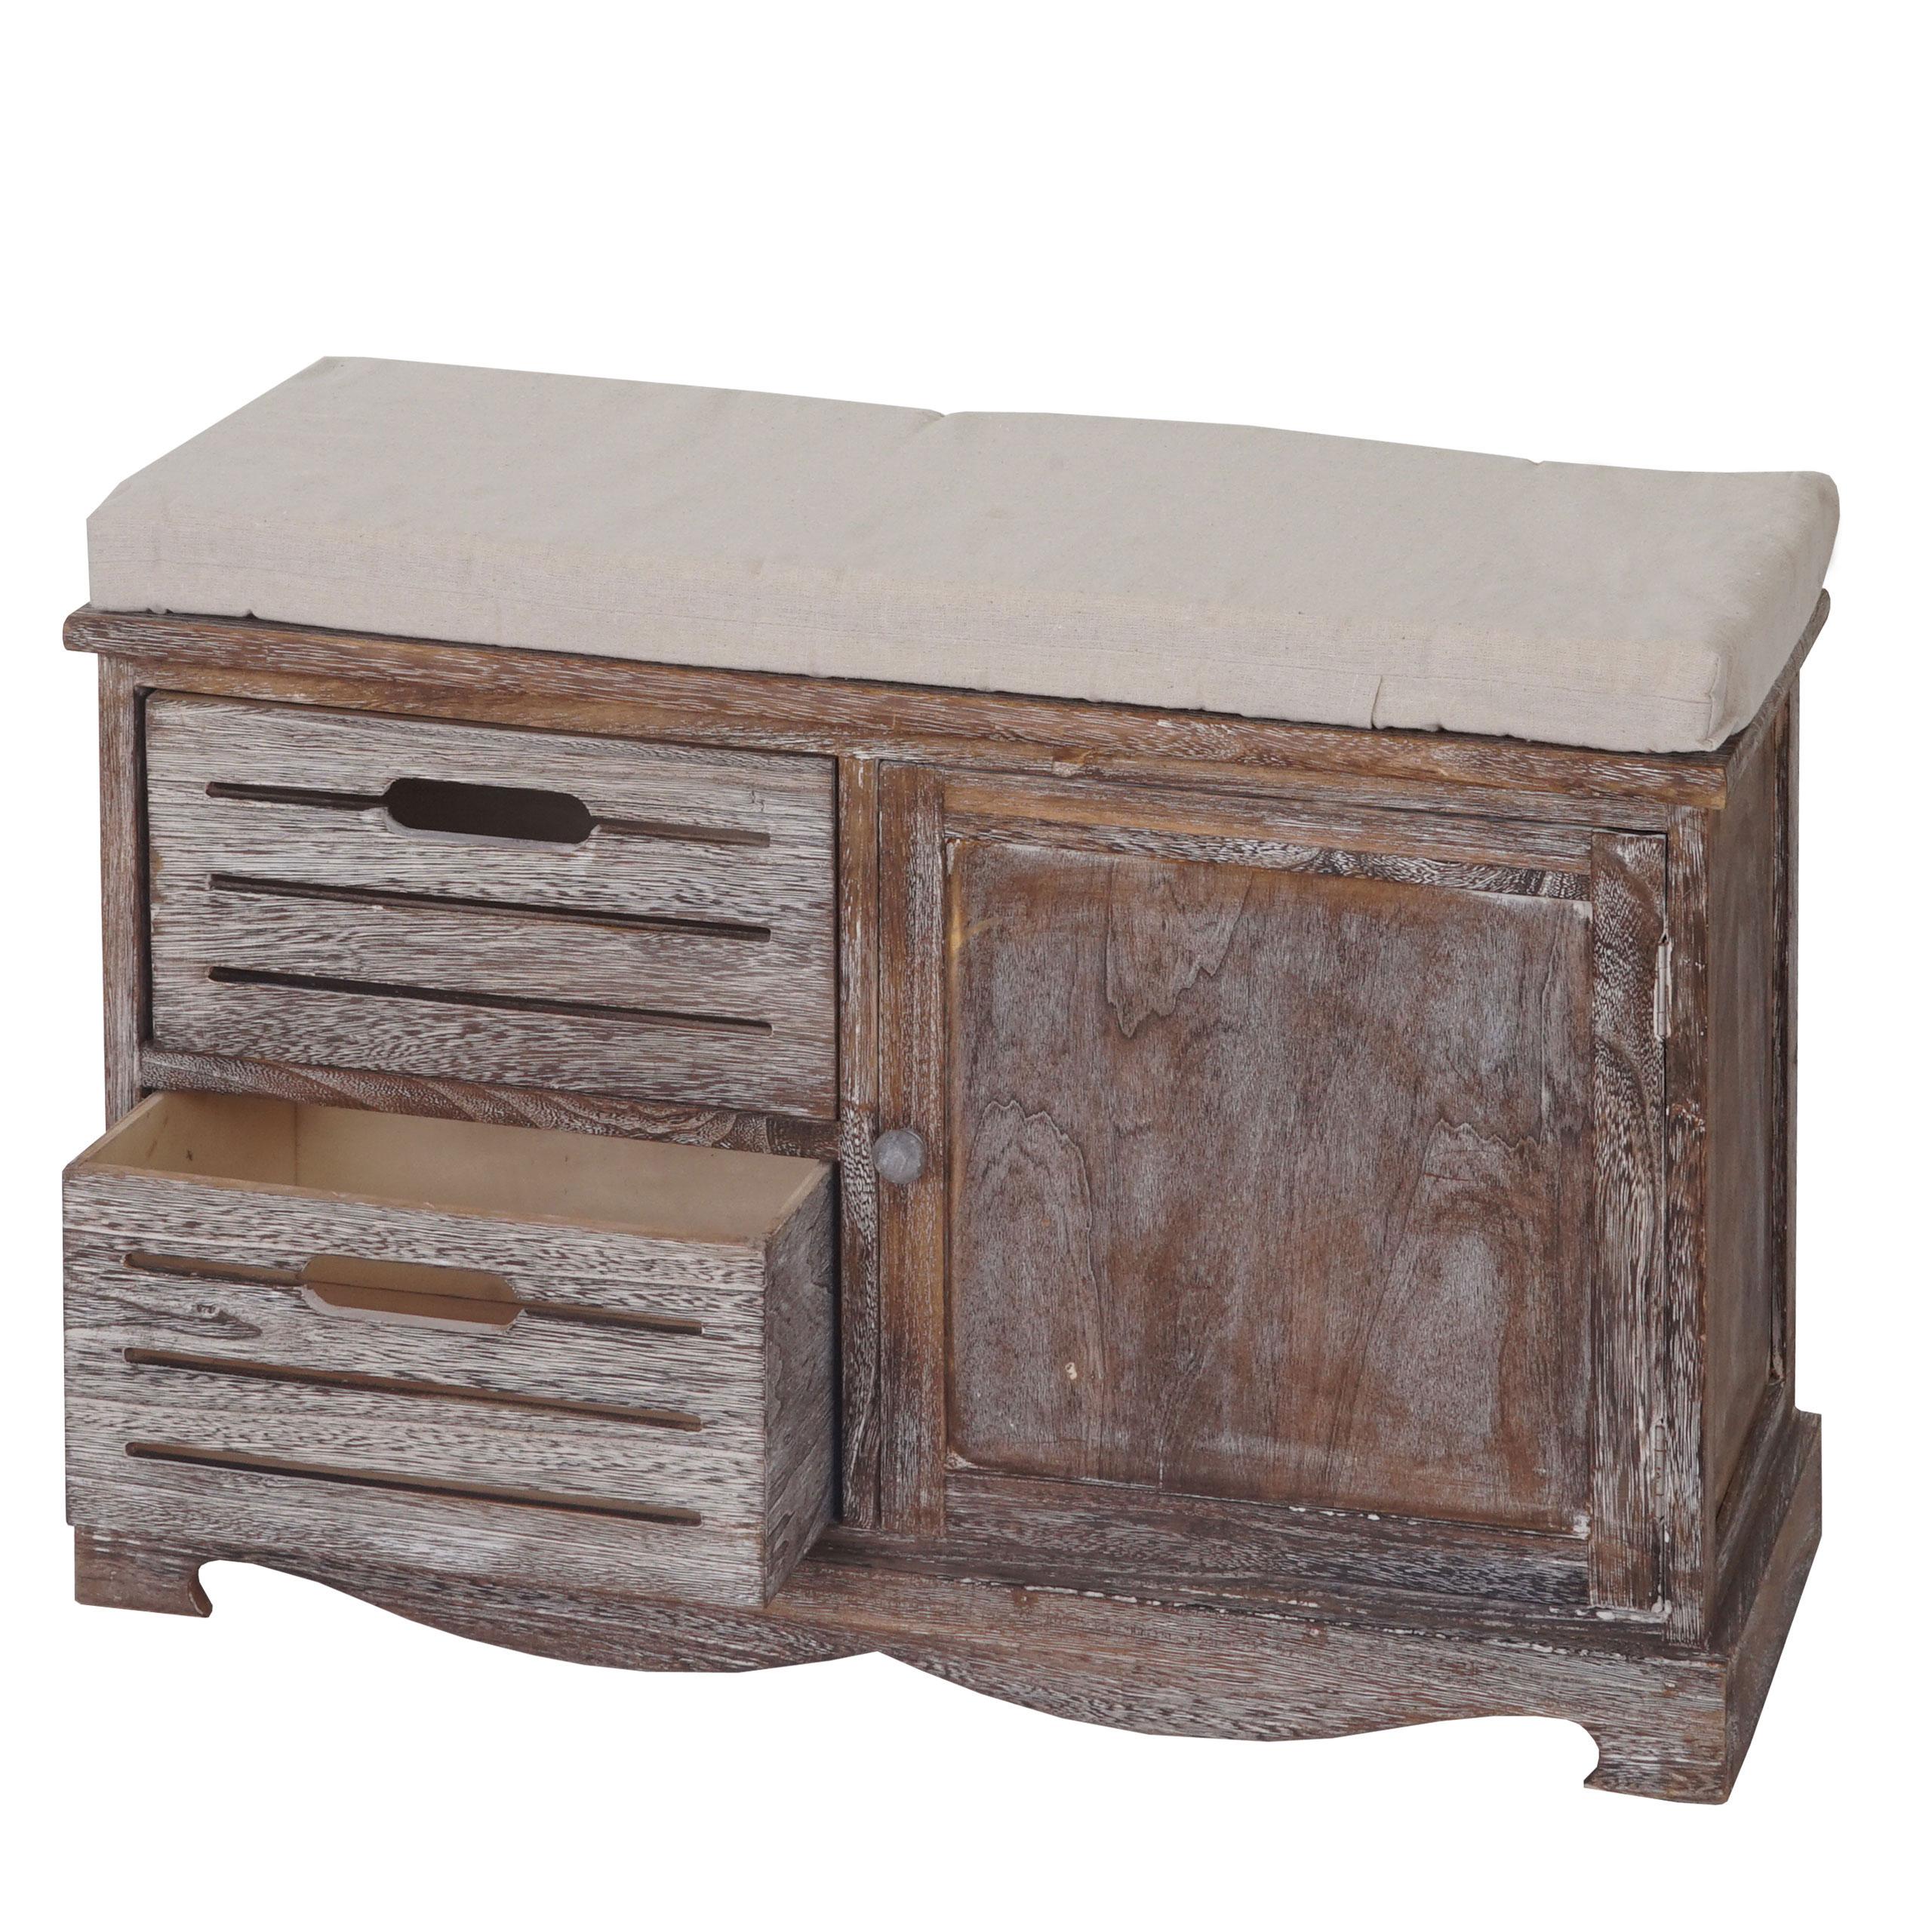 Sitzbank Ascoli Bank Kommode Shabby Look Vintage 49x71x32cm Braun